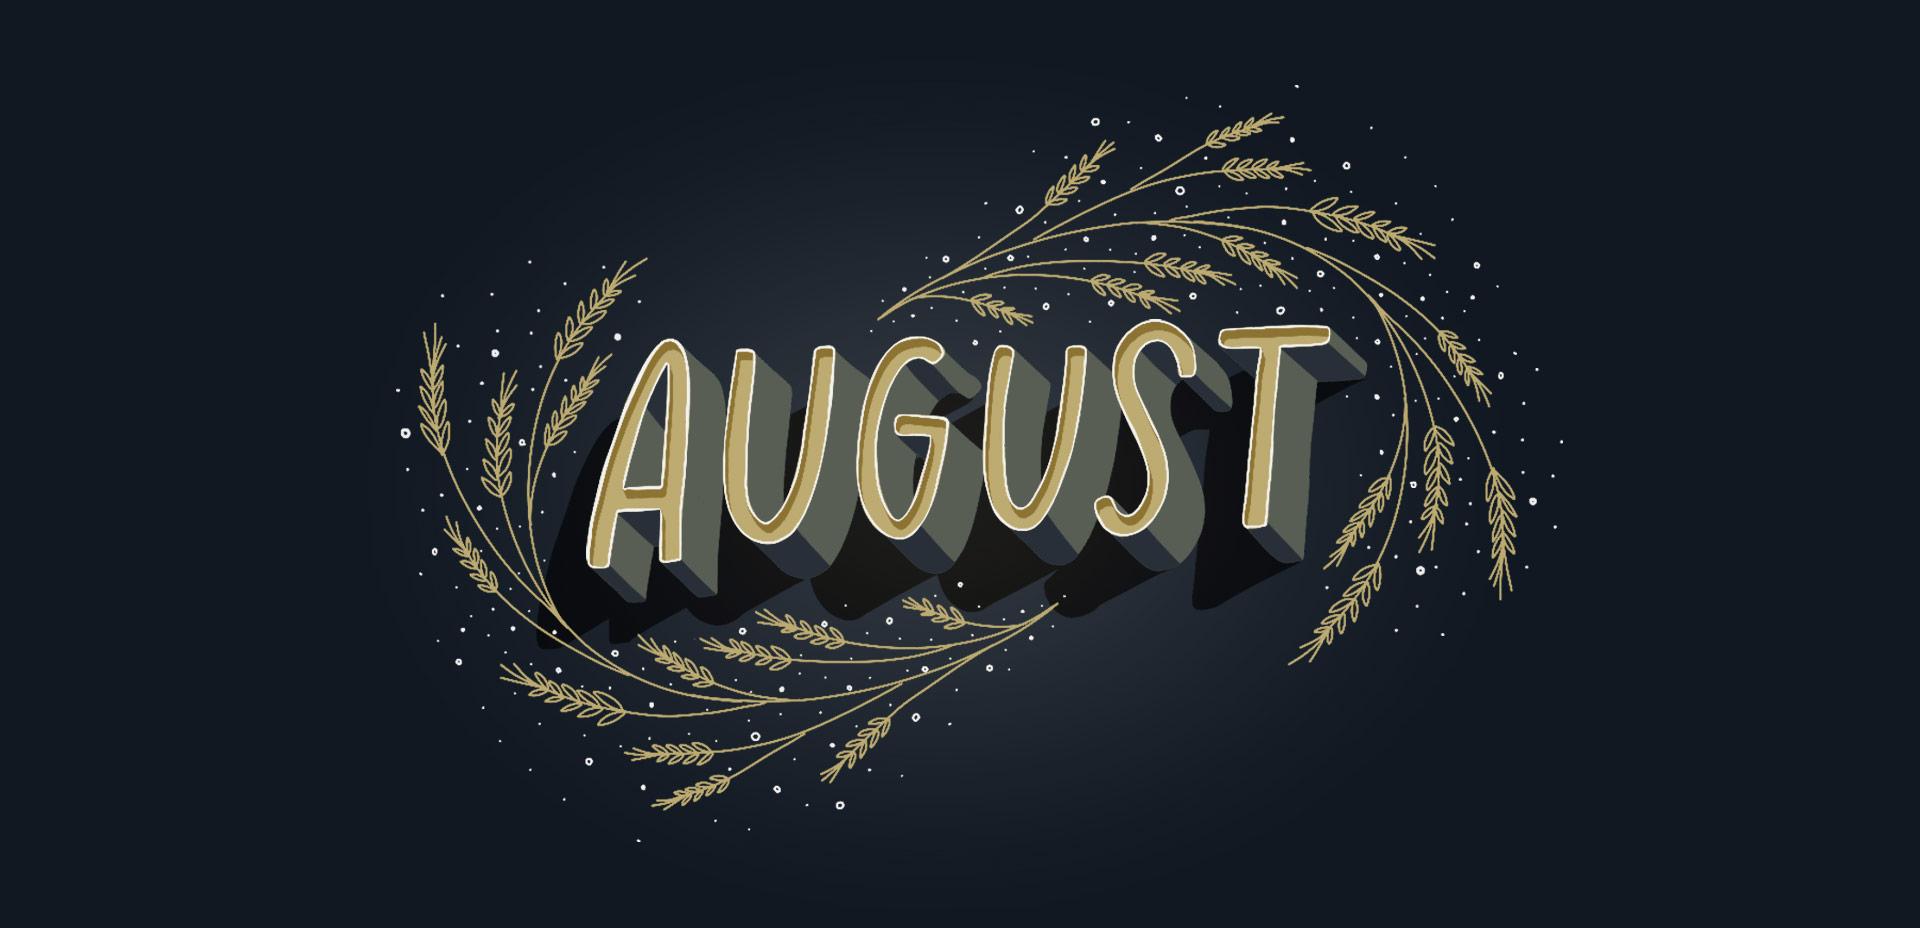 Freebie August 2018 Desktop Wallpapers   Every Tuesday 1920x928